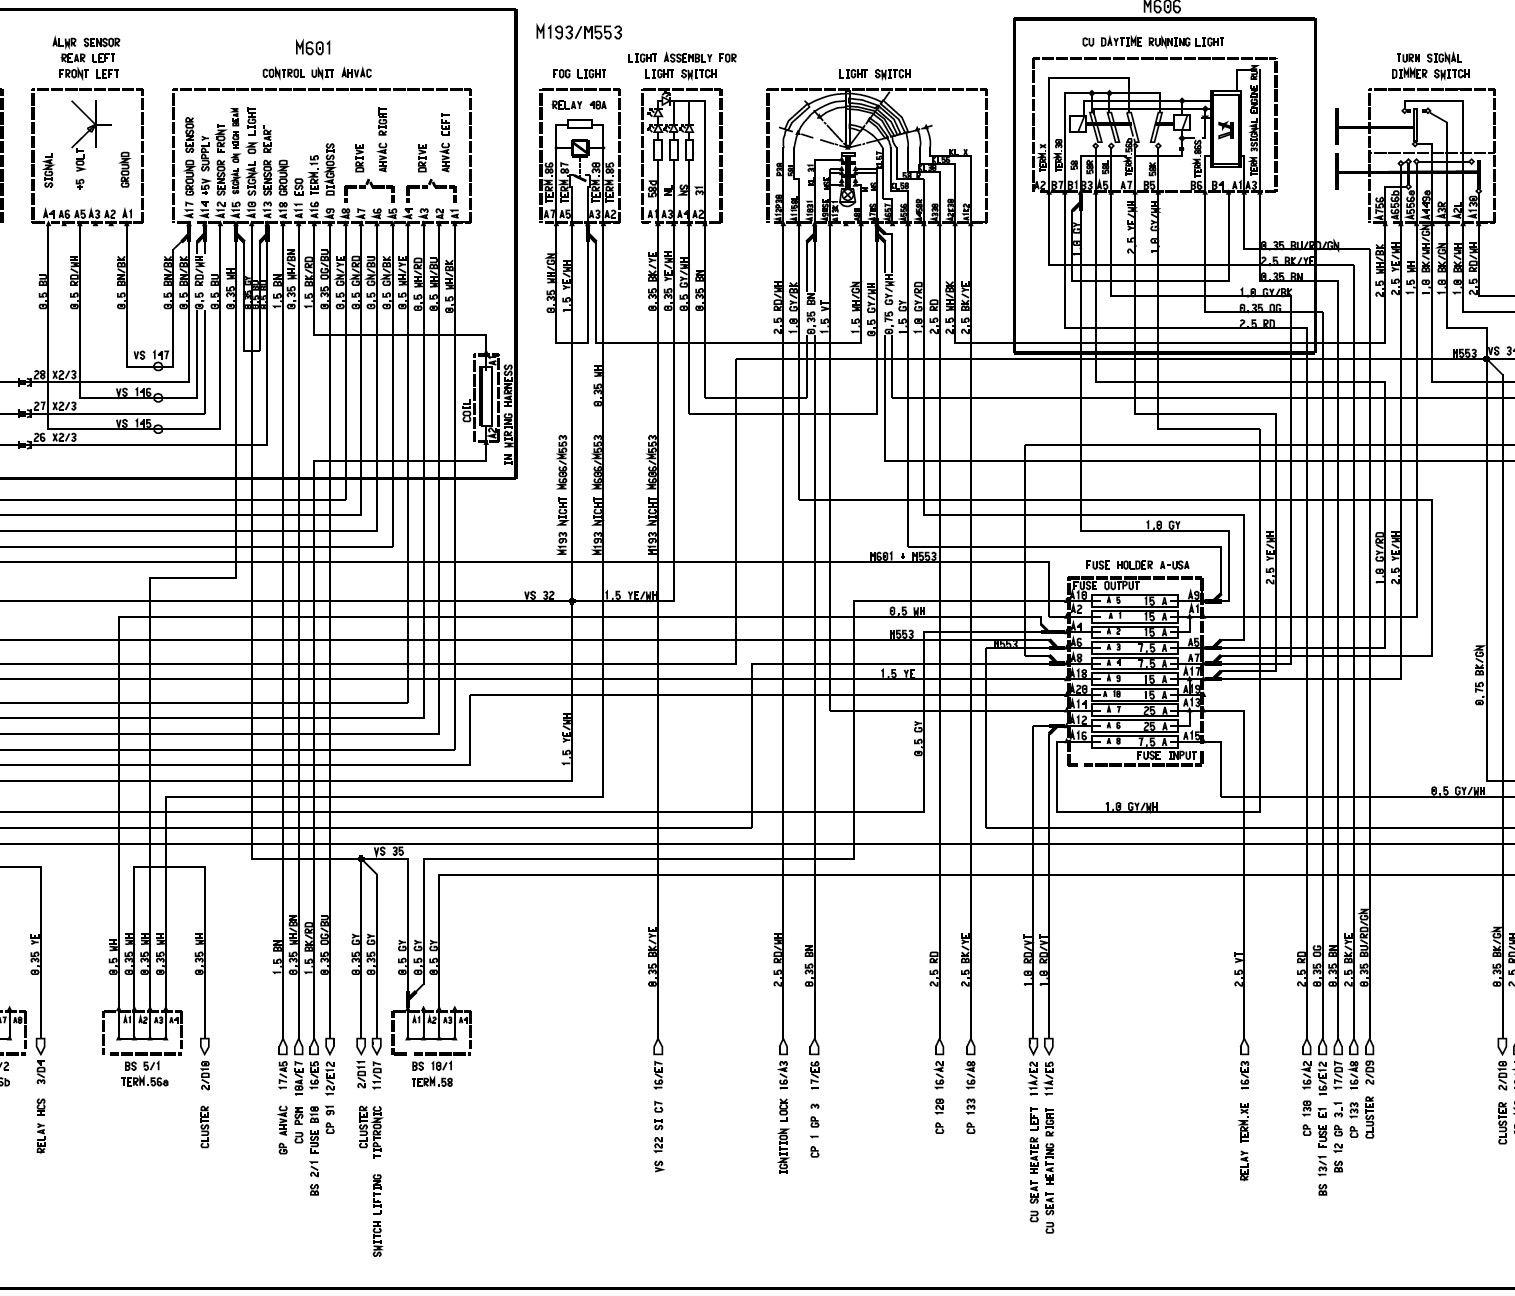 2002 Porsche 911 Wiring Diagram Fuse Box Schematics 2001 Engine Problems Rh Banyan Palace Com 1984